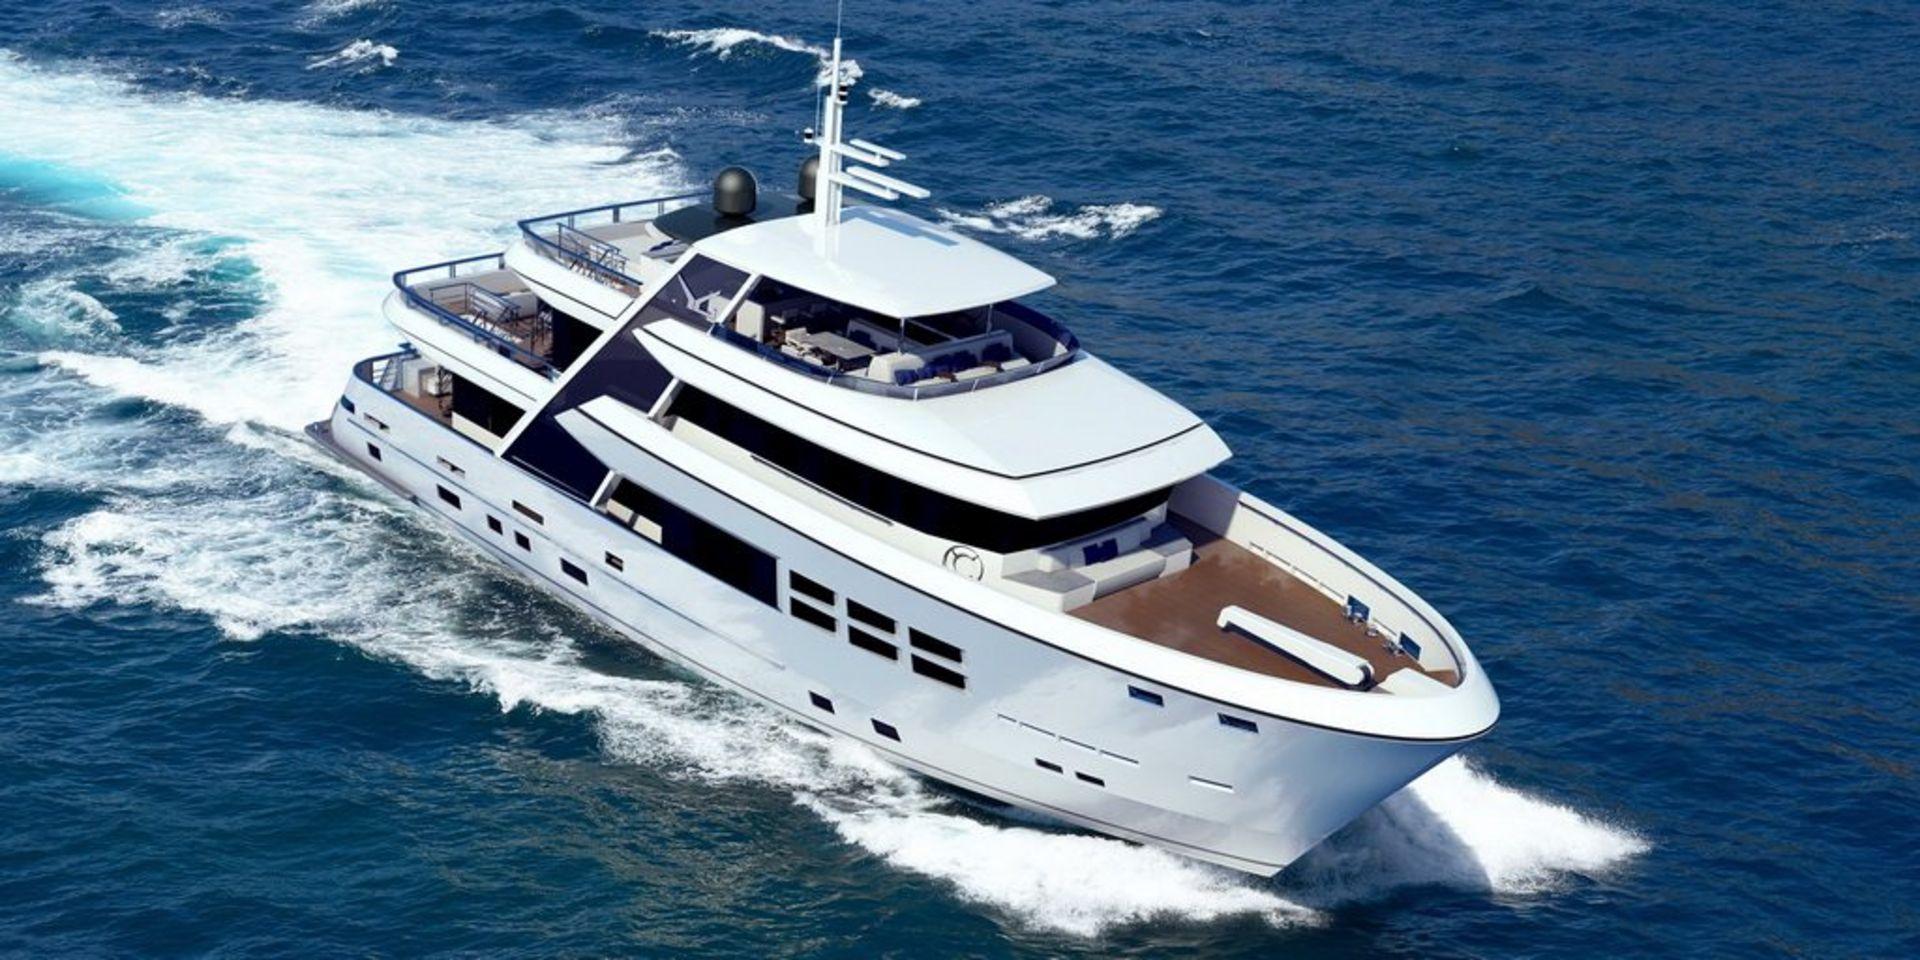 Bandido 100 - Bandido Yachts by Drettmann - Drettmann Yachts